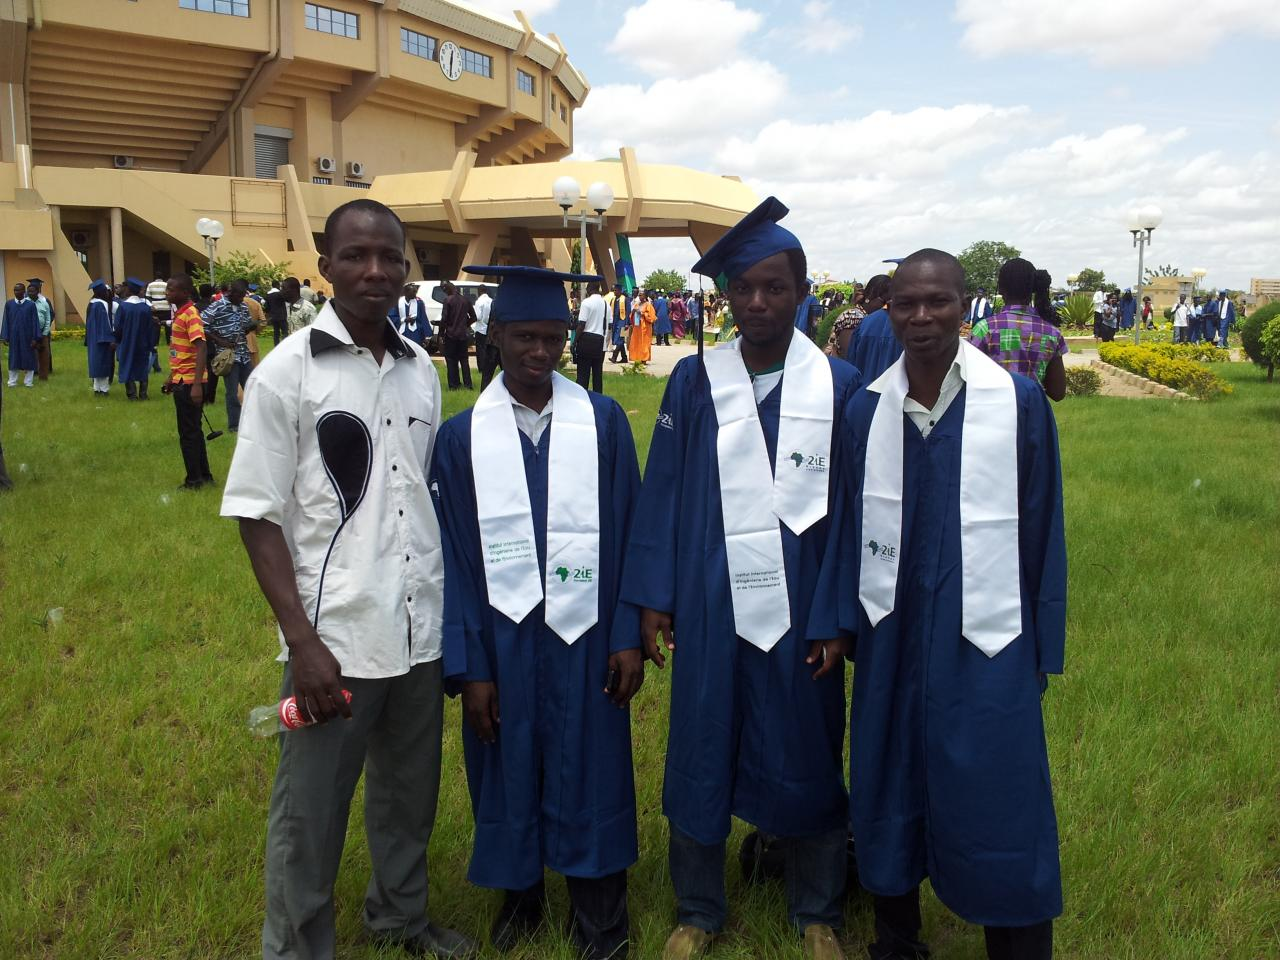 Au centre des 3 Diplômés, le Nigérians LIASU TAJU Olatundé